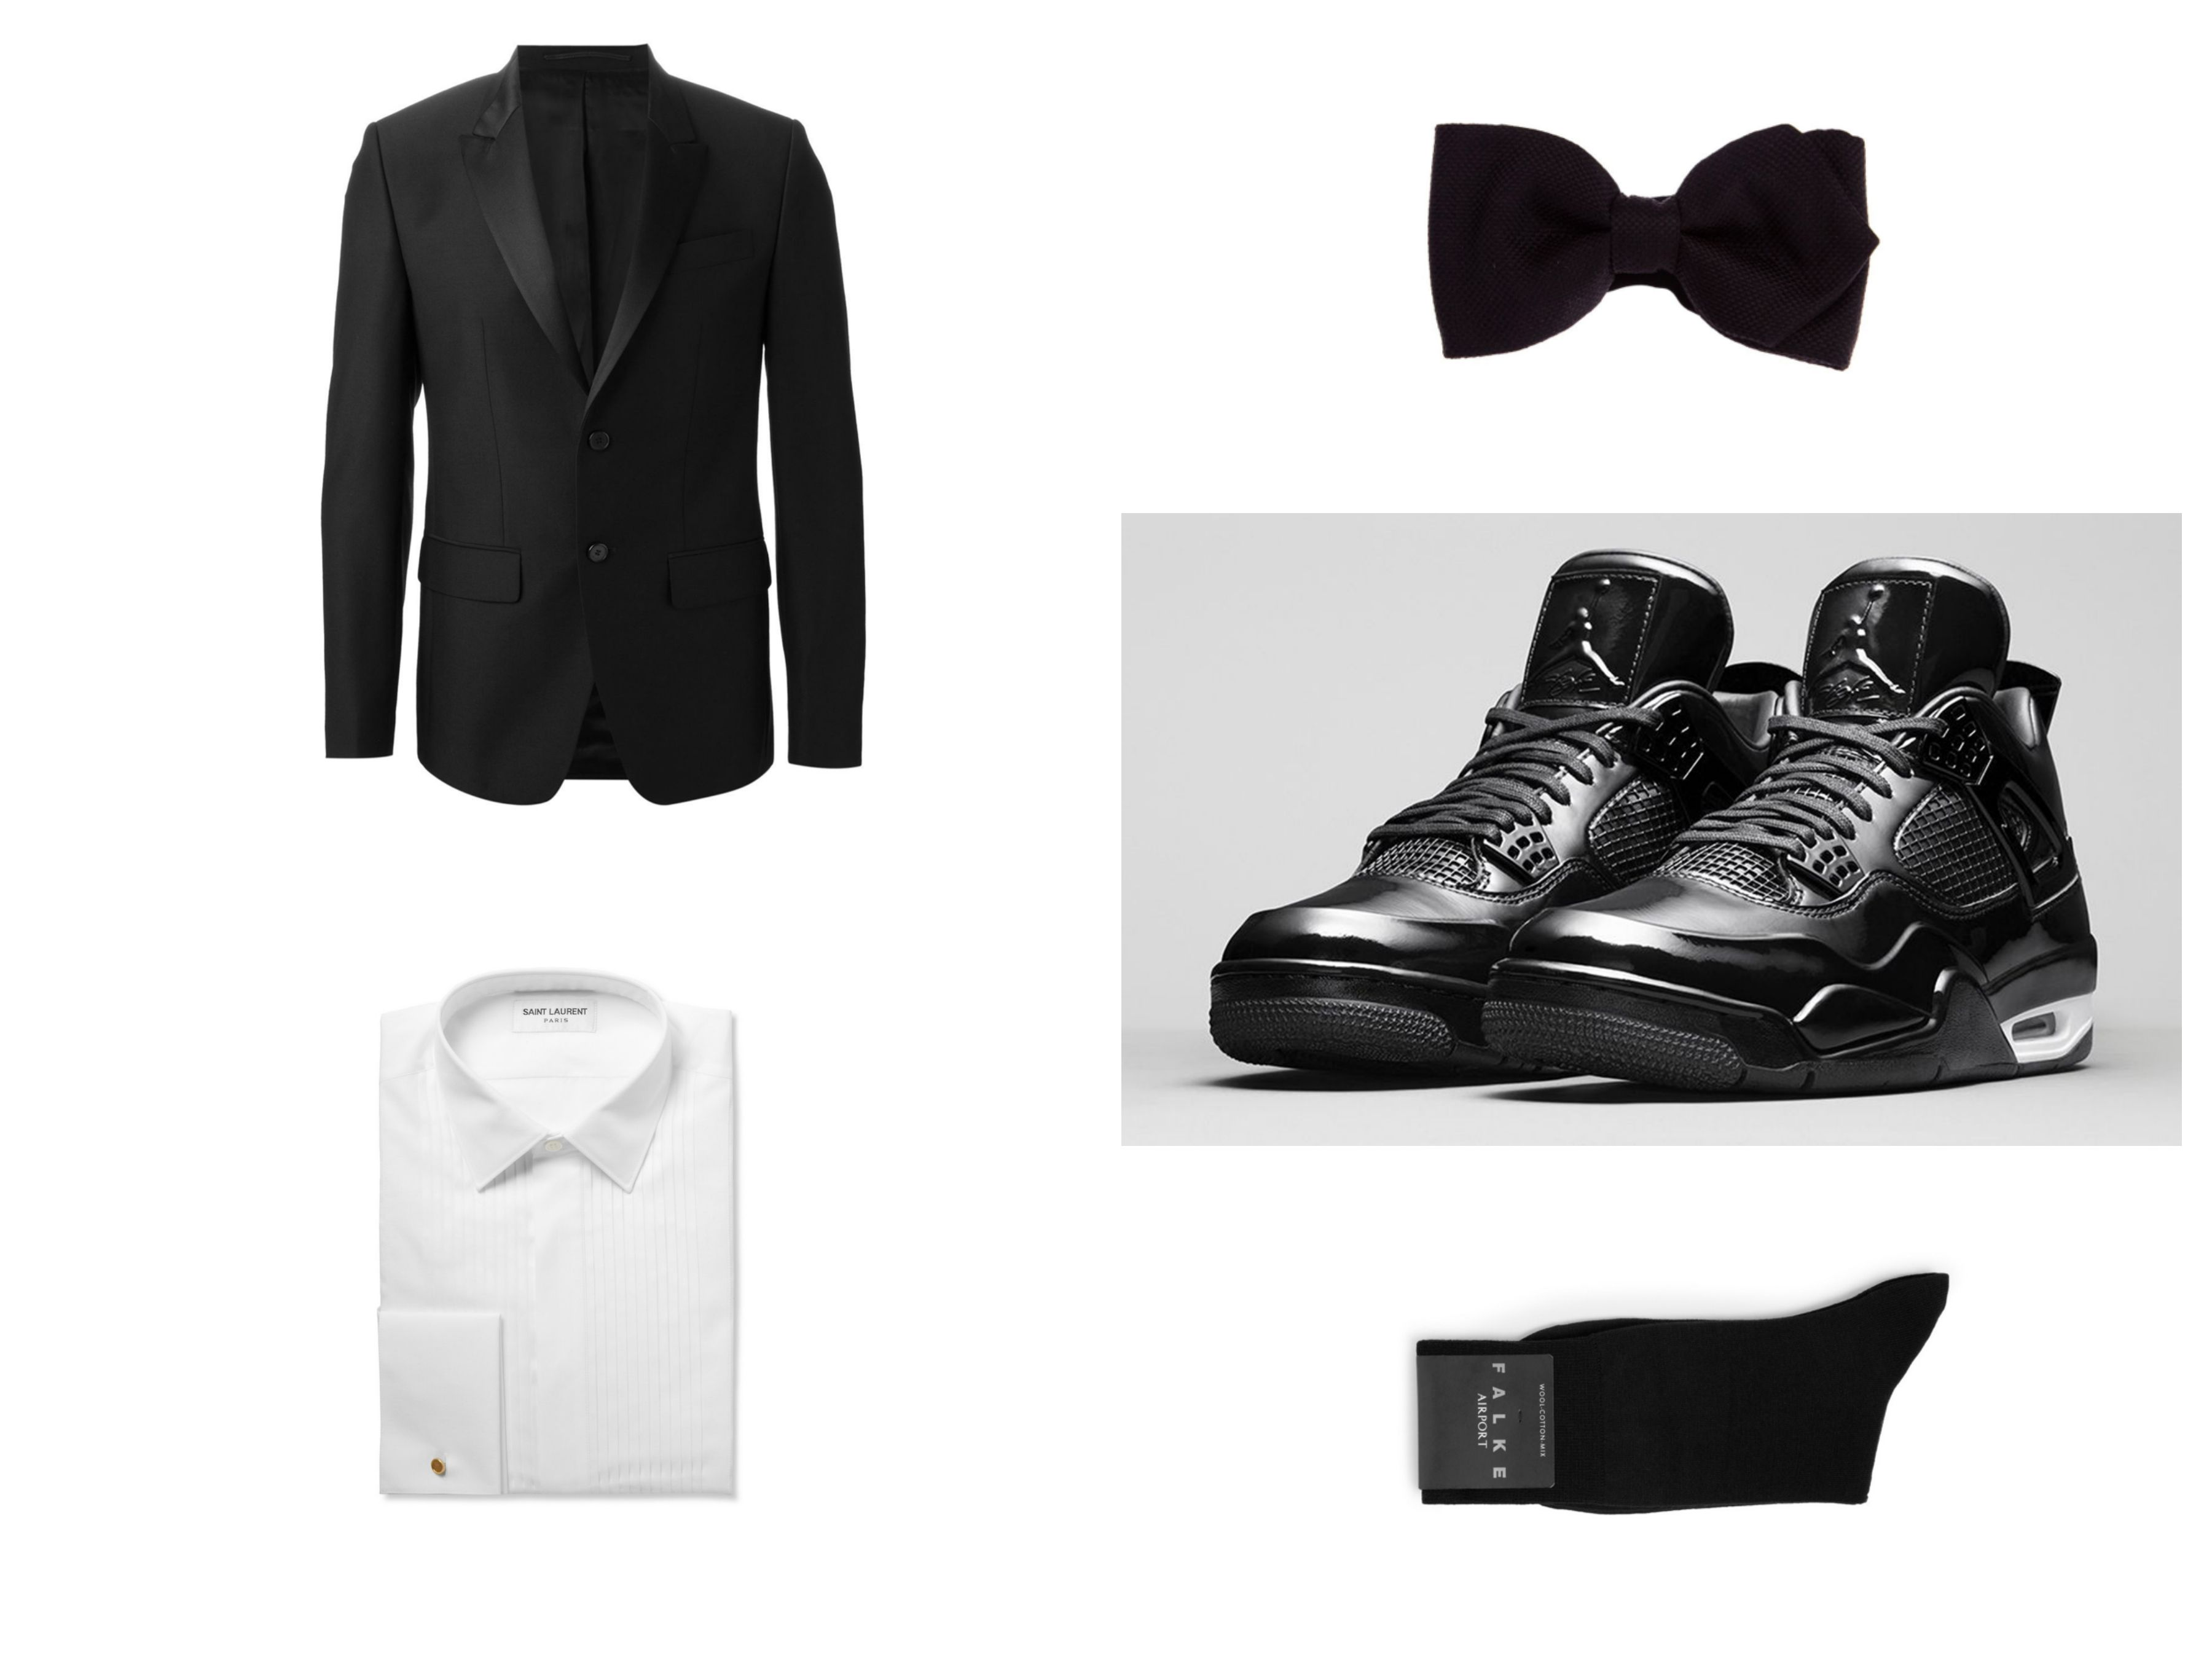 Air Jordans 11Lab4 - Nike Sneakers You